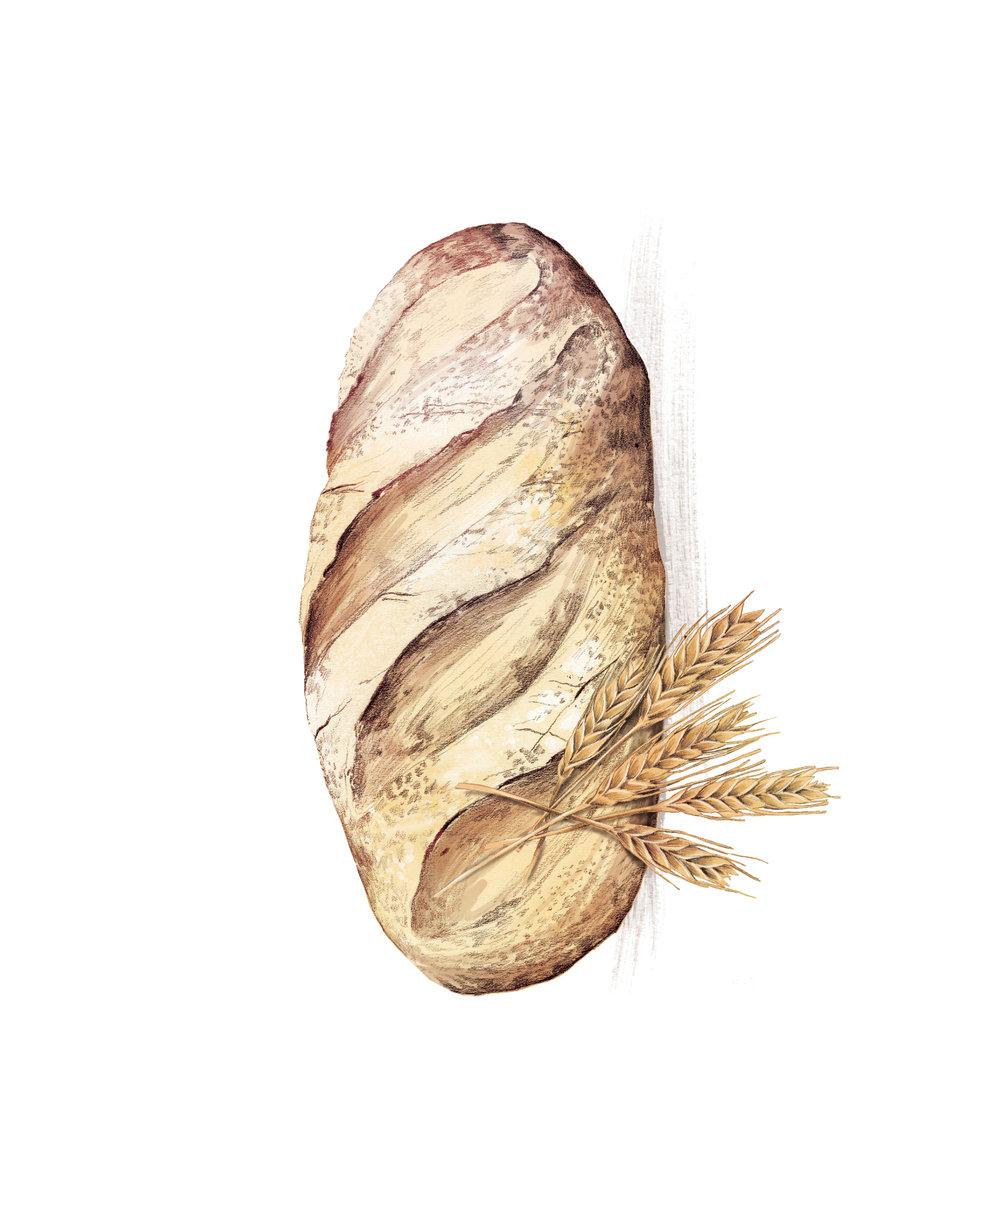 ZeitWissen_Bread_Gluten_LaScarlatte_5.jpg